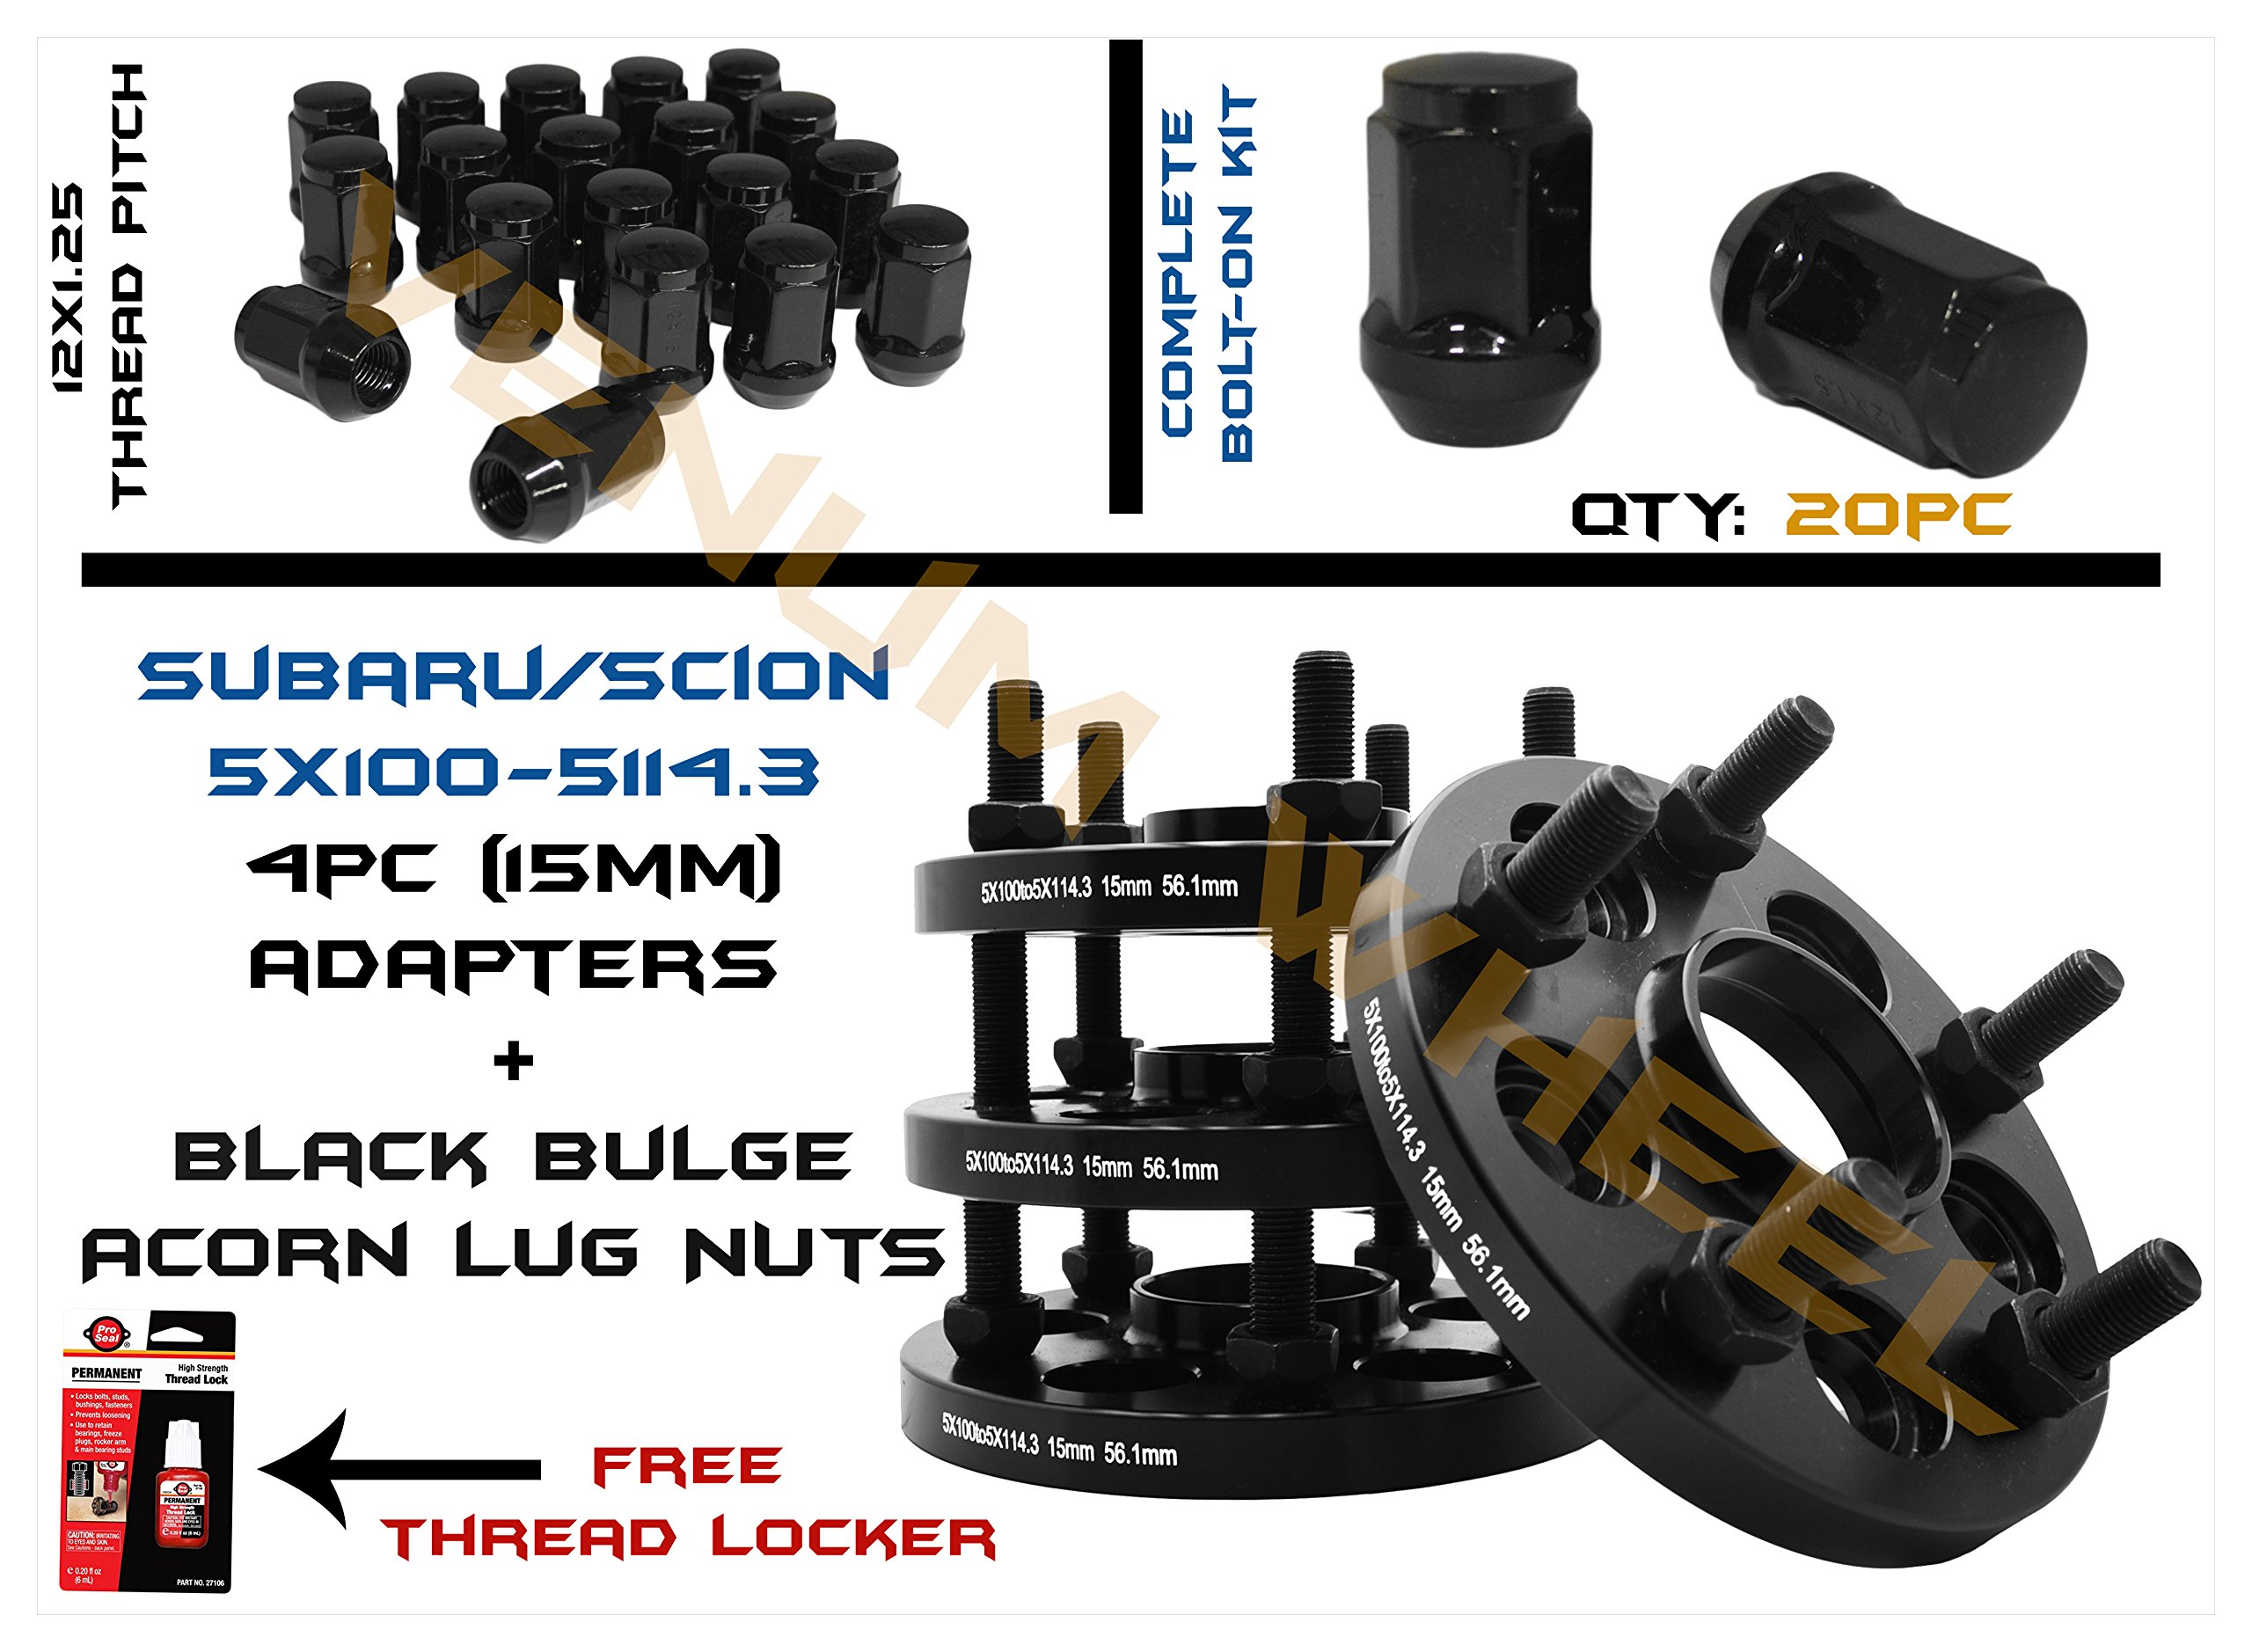 4pc 15mm Subaru Conversion Adapter Kit 5x100 to 5x114.3 56.1mm Hub Centric | 20 Black Bulge Acorn Lug Nuts M12x1.25 Thread Pitch